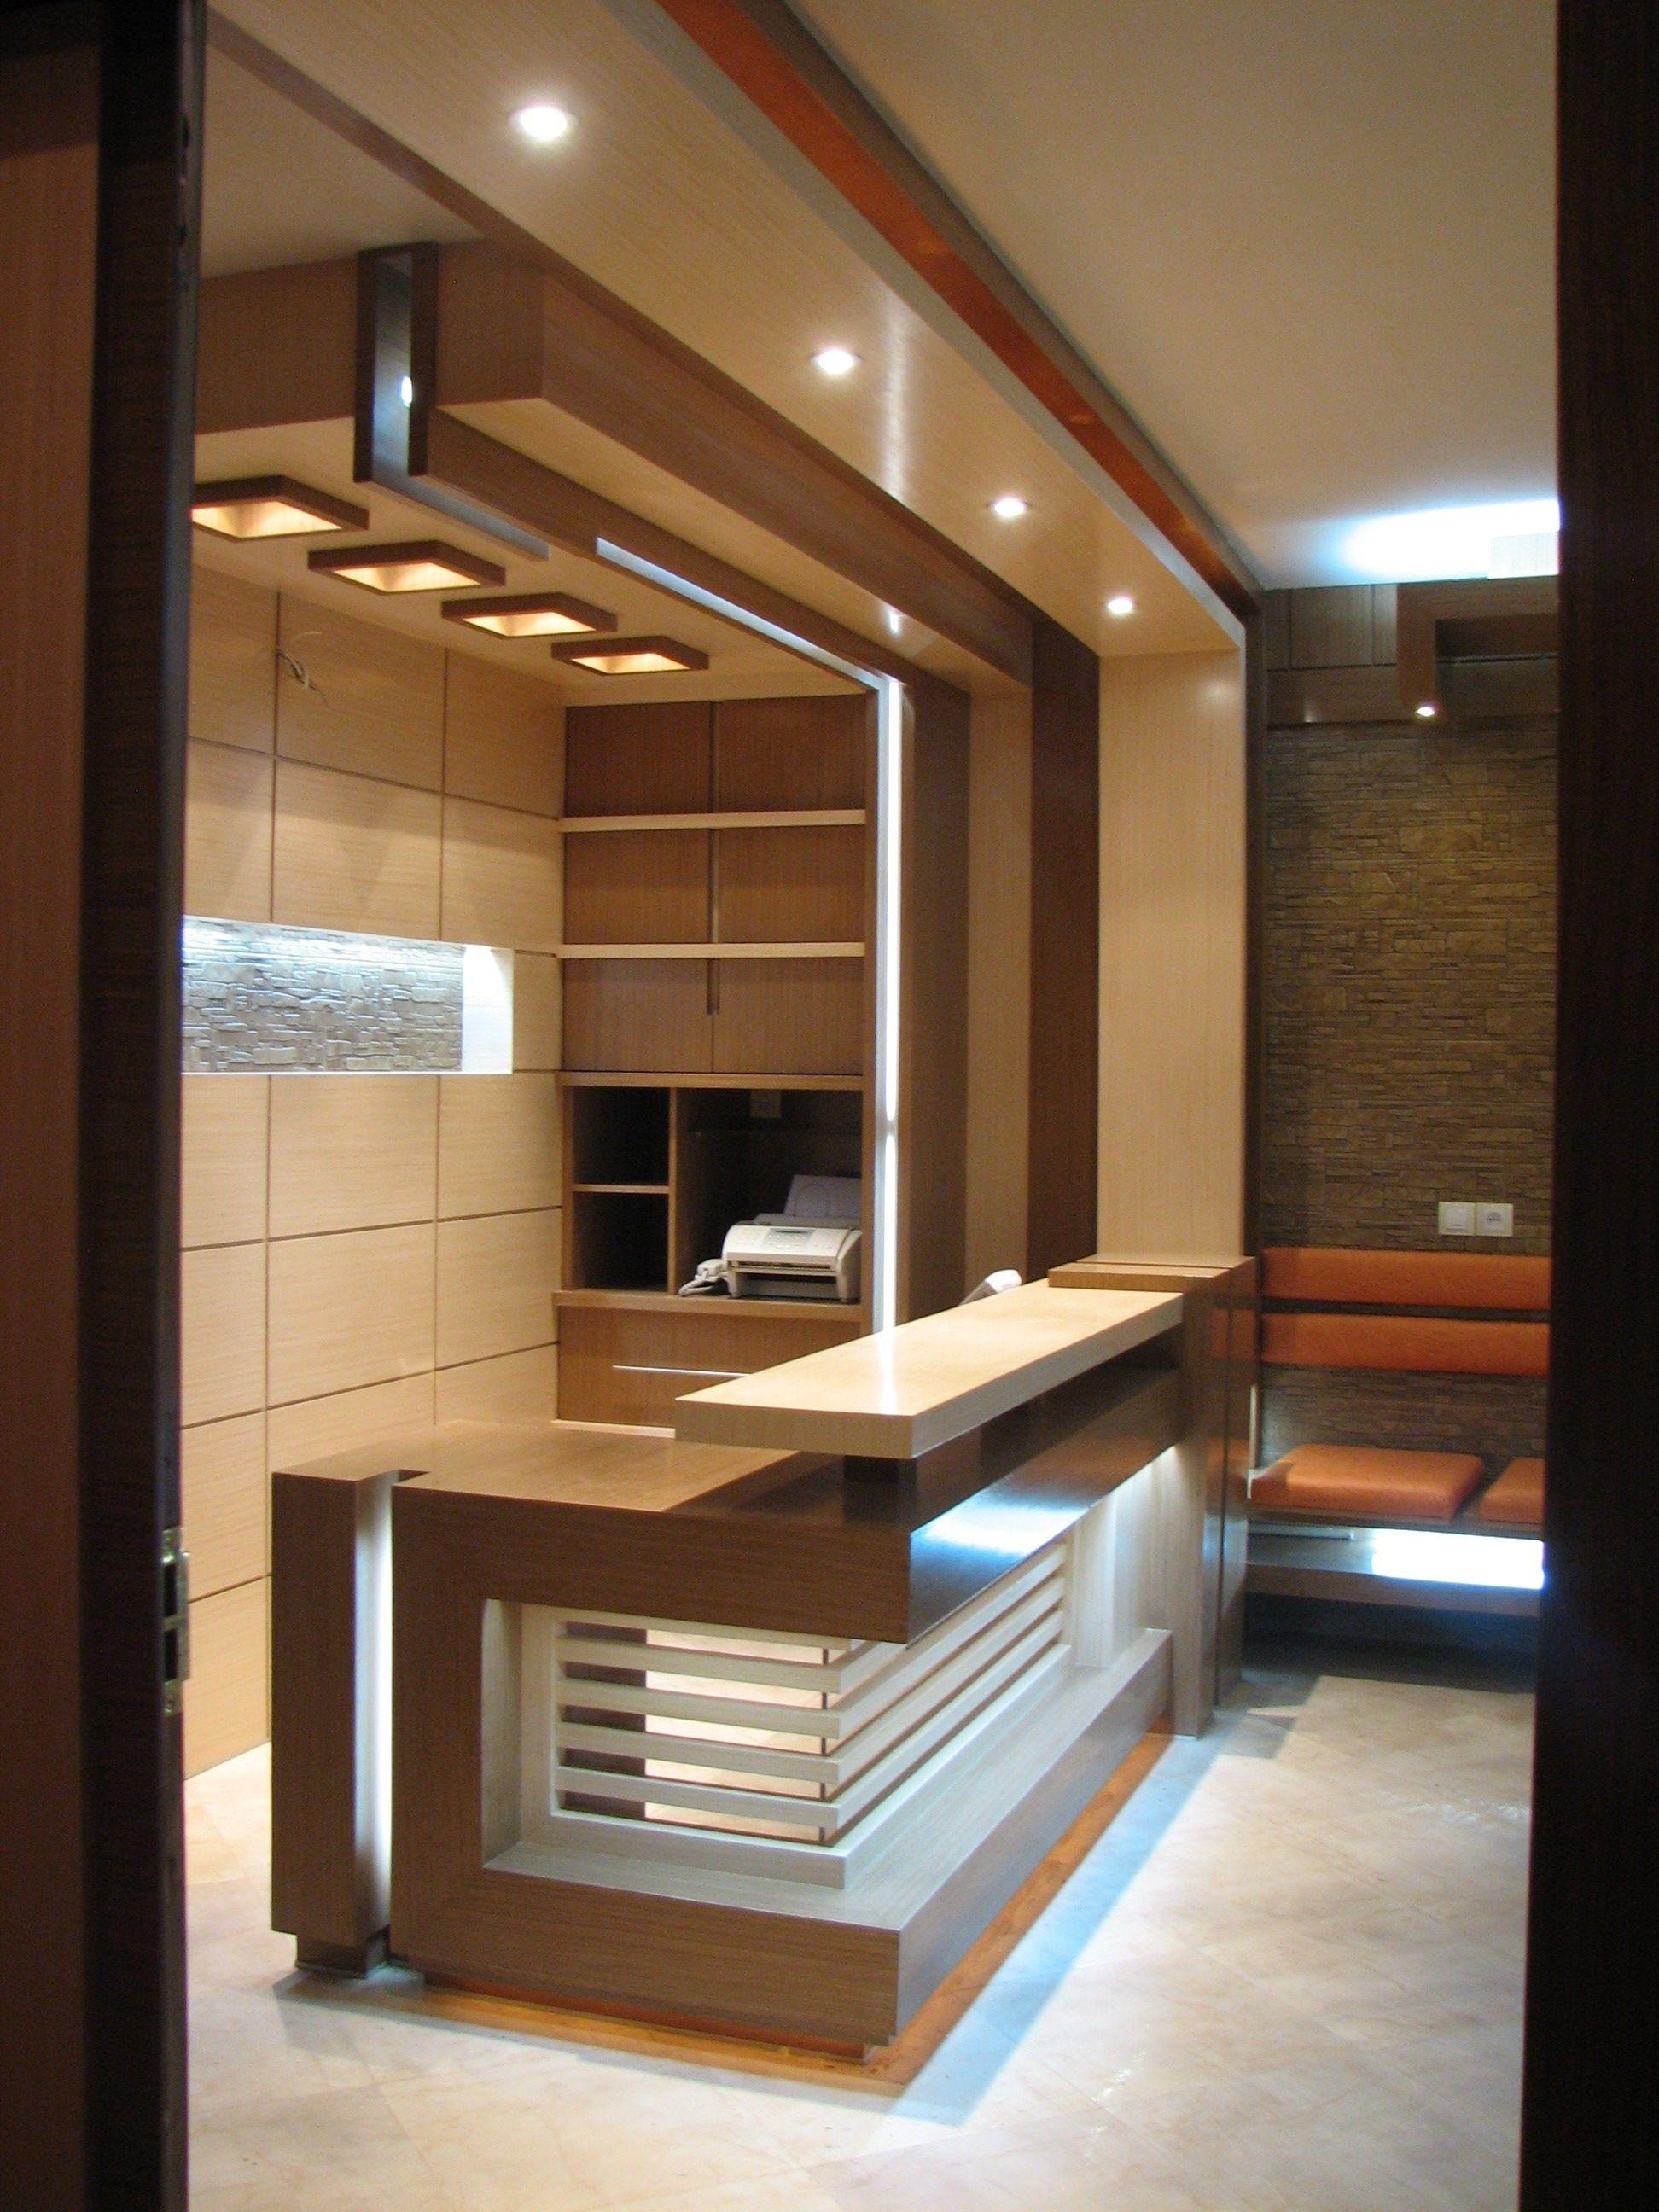 Interior design dental clinic mehrzad rafeei bar for Dental office design chapter 6